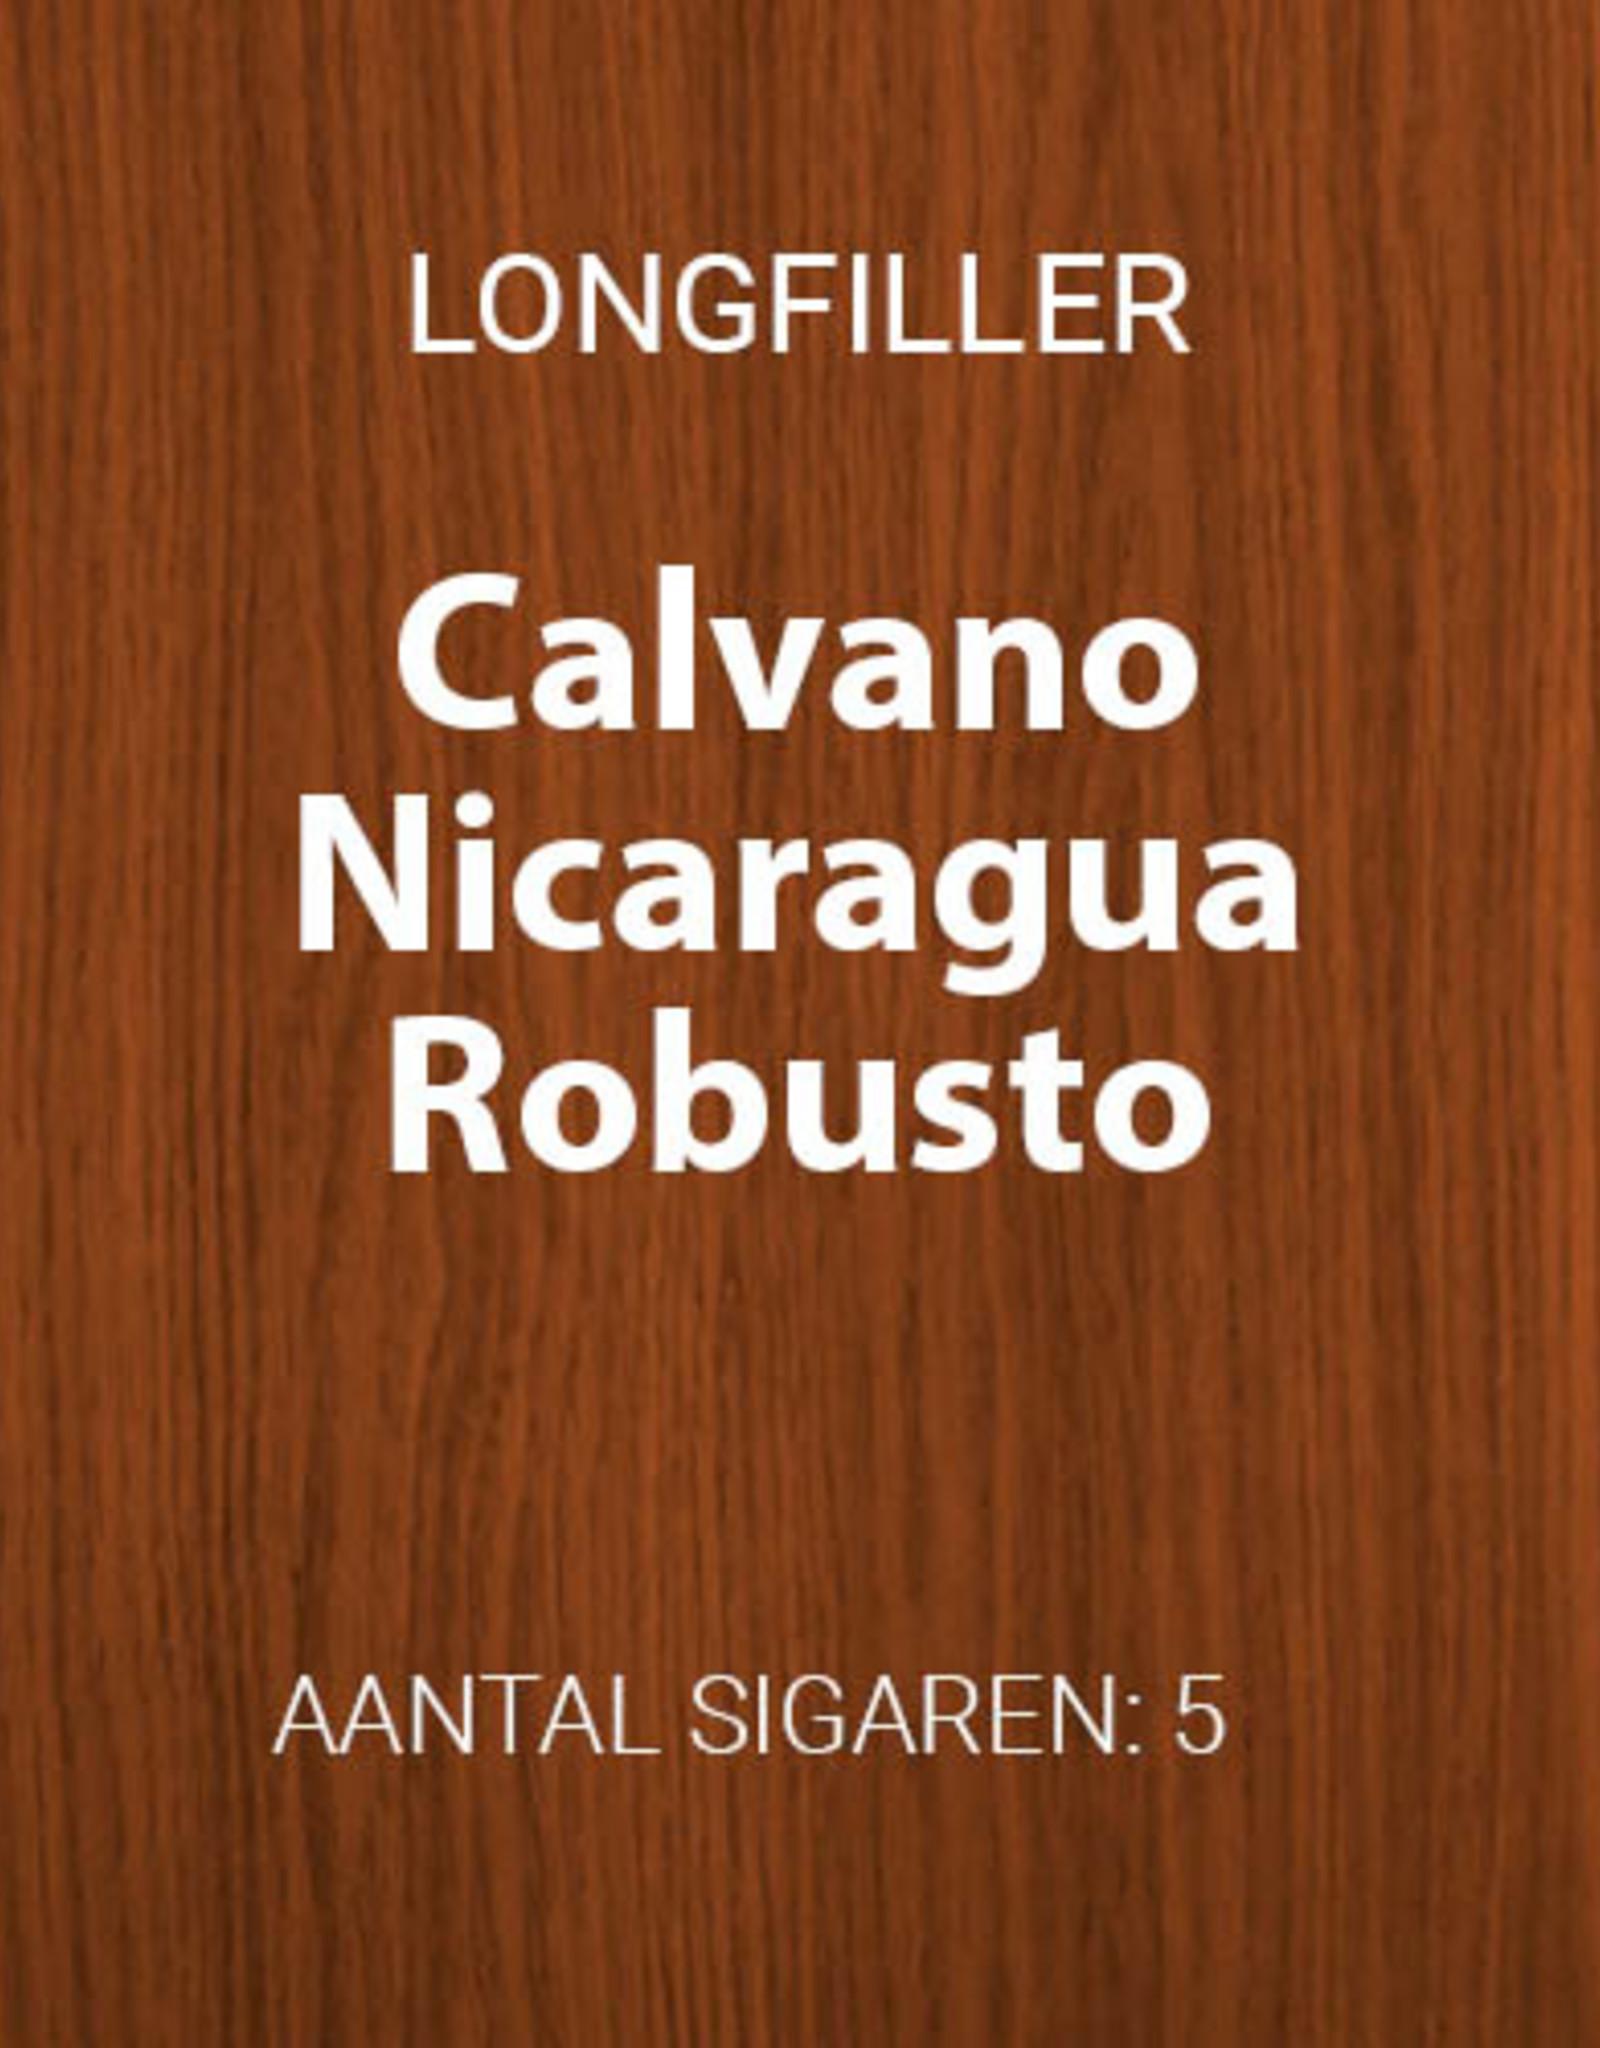 Calvano Nicaragua Robusto